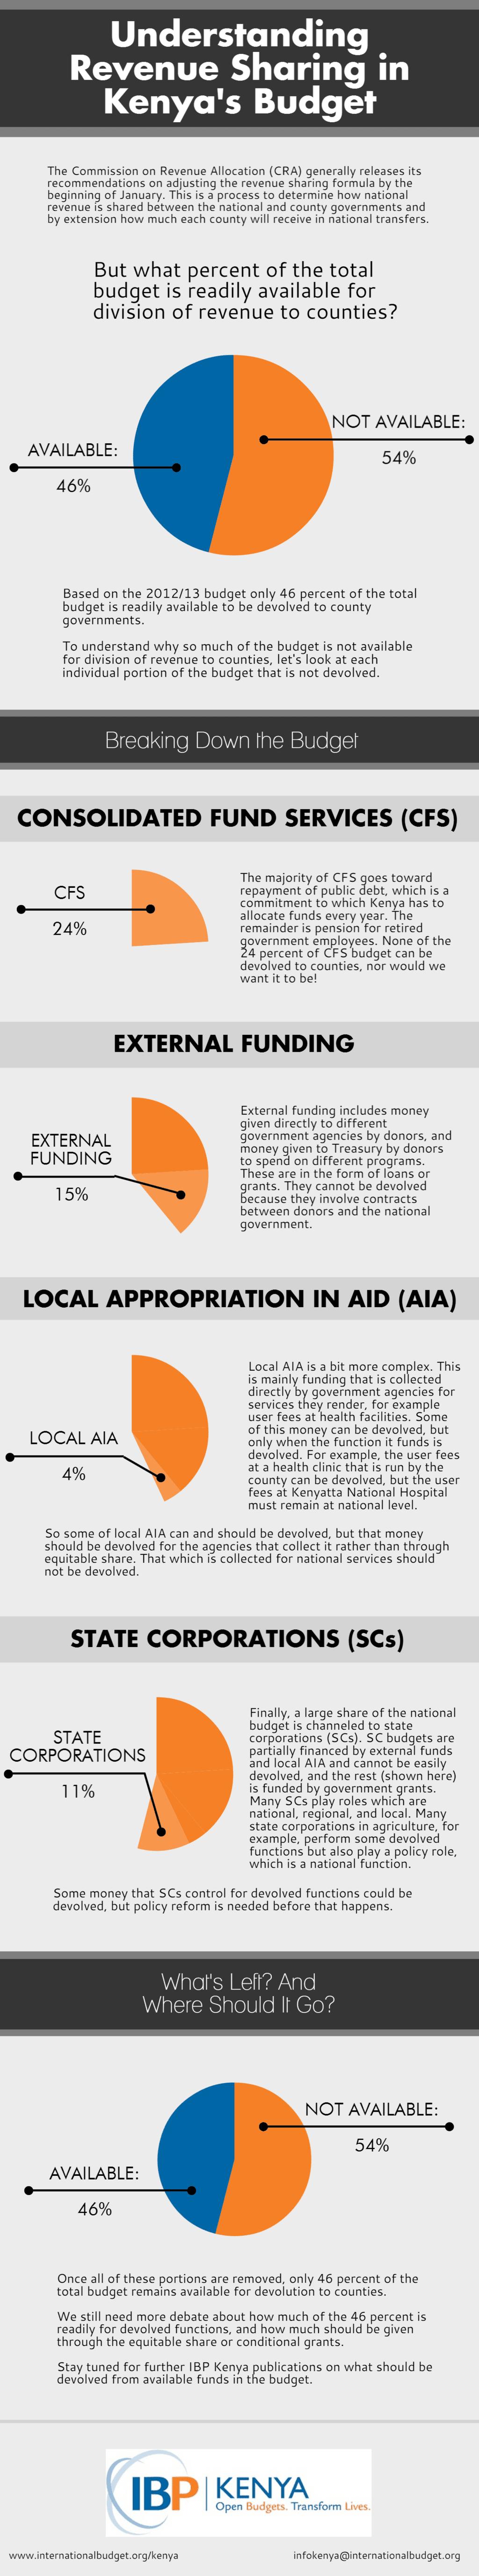 Understanding-Revenue-Sharing-in-Kenyas-Budget-Infographic